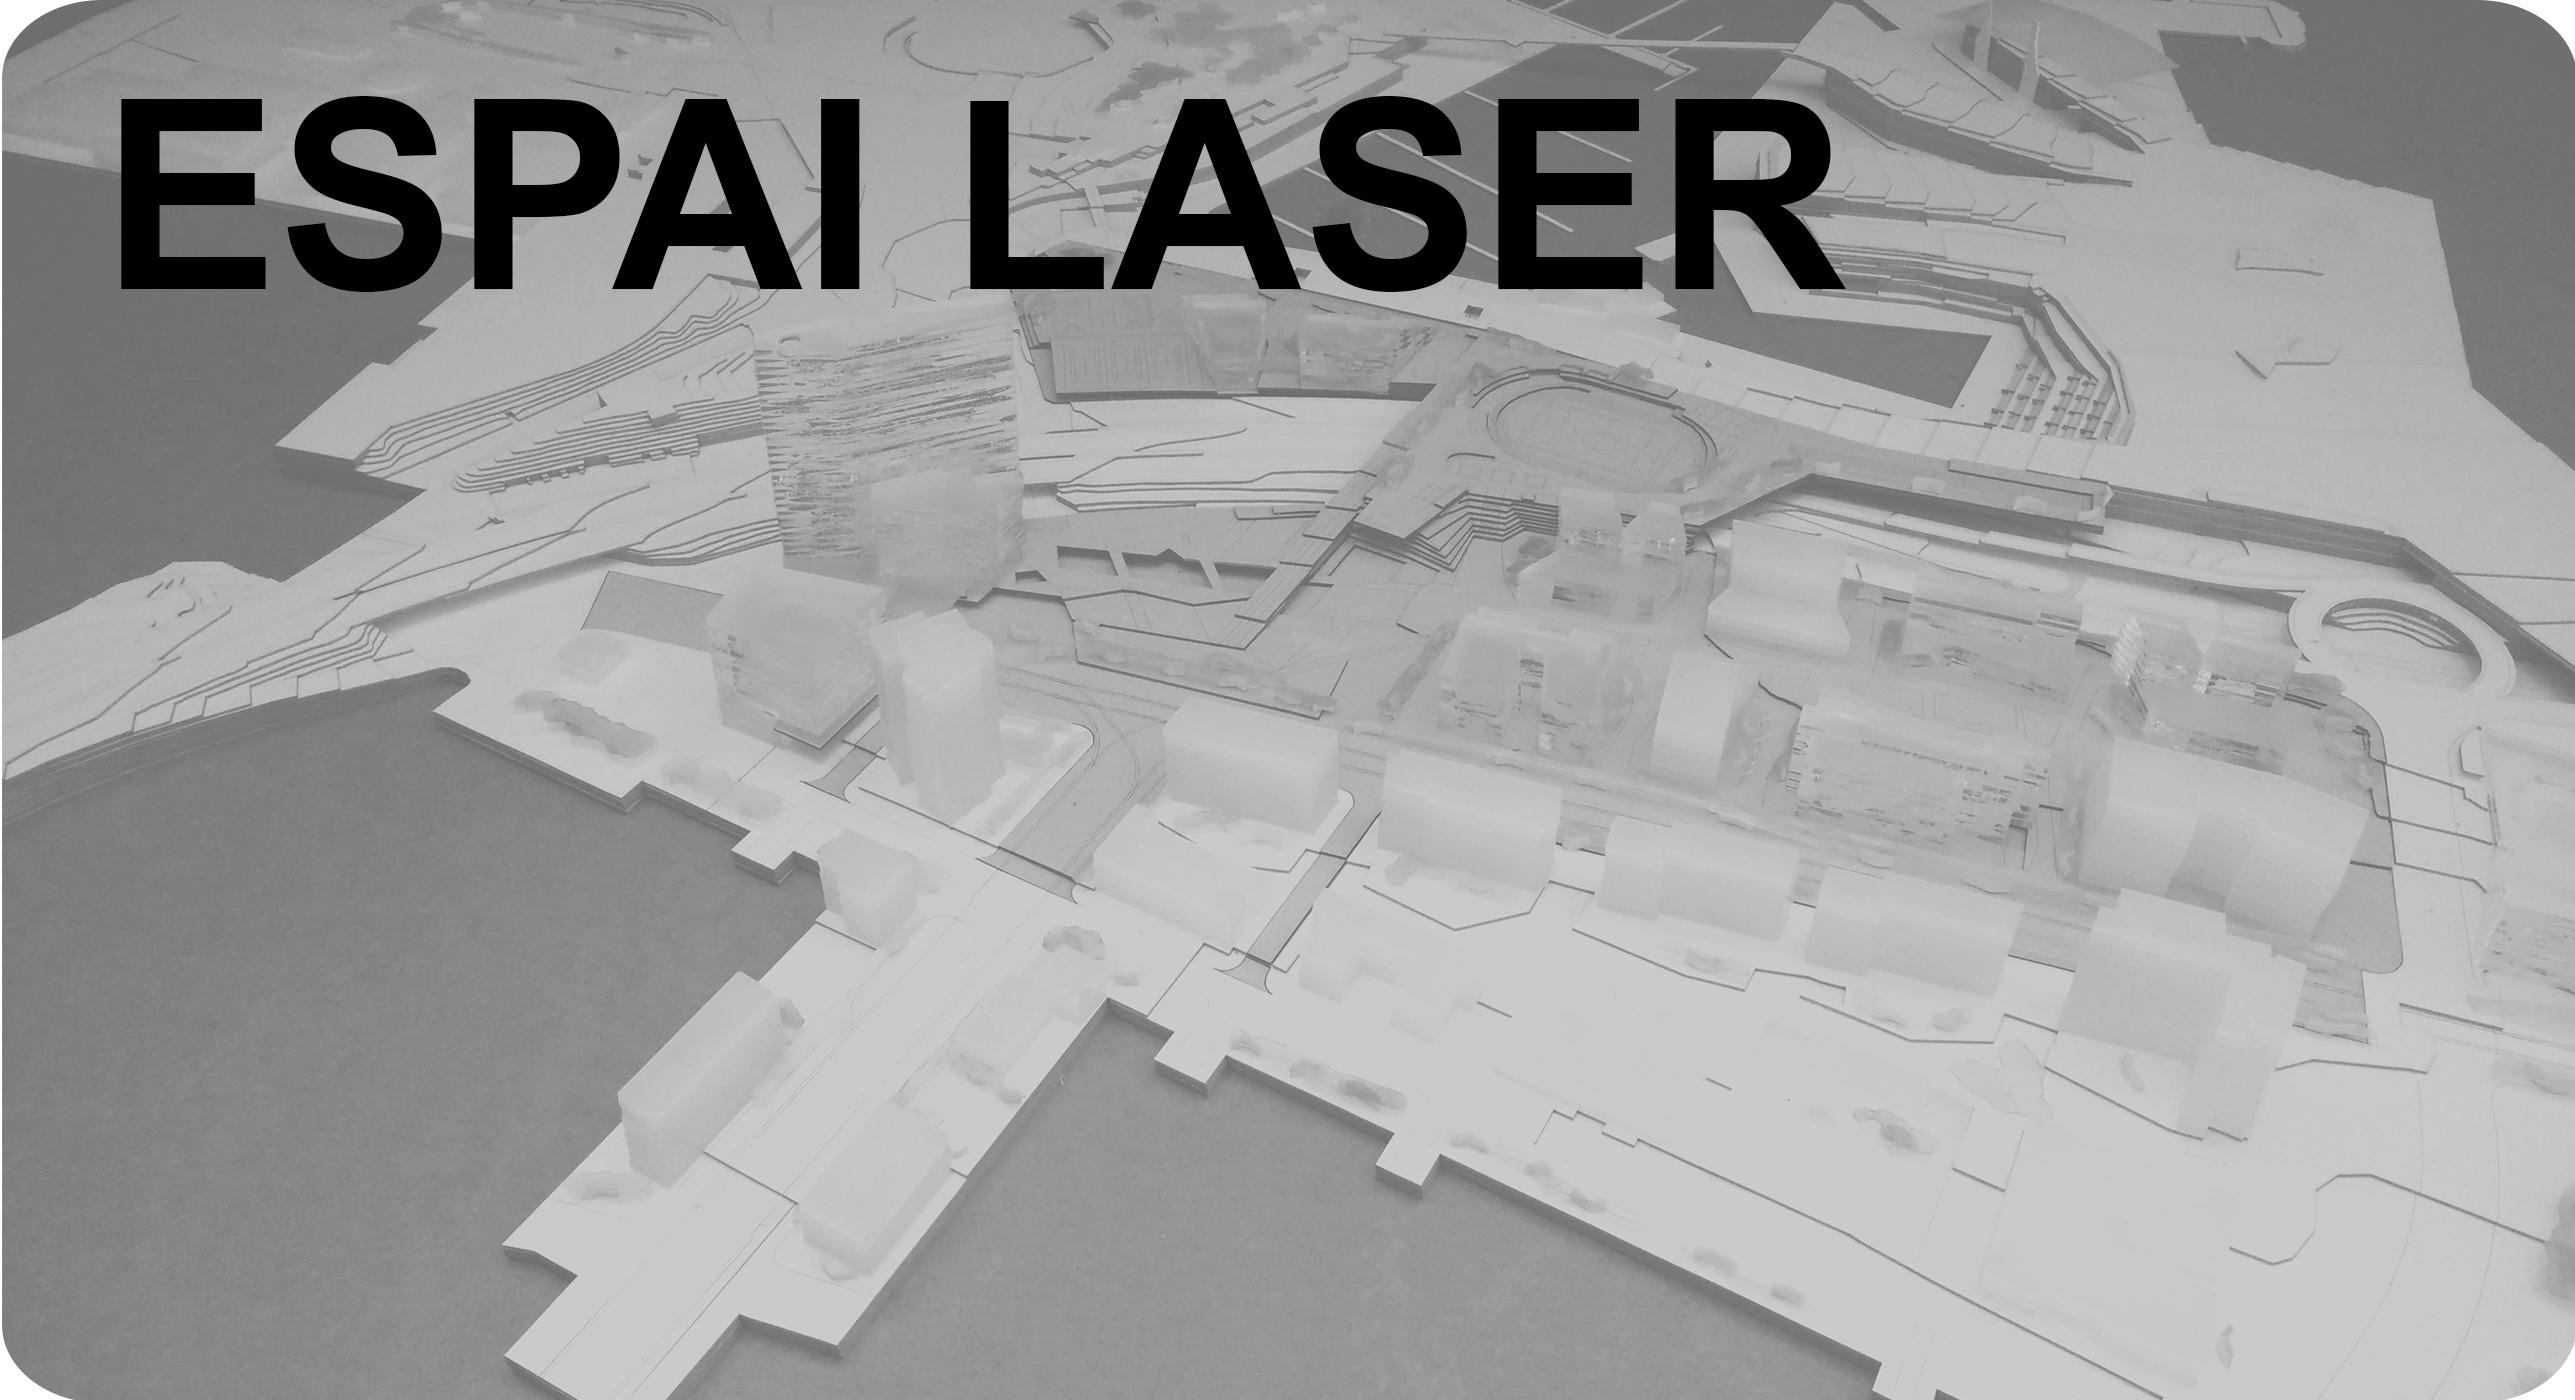 BN_ESPAI_LASER.jpg